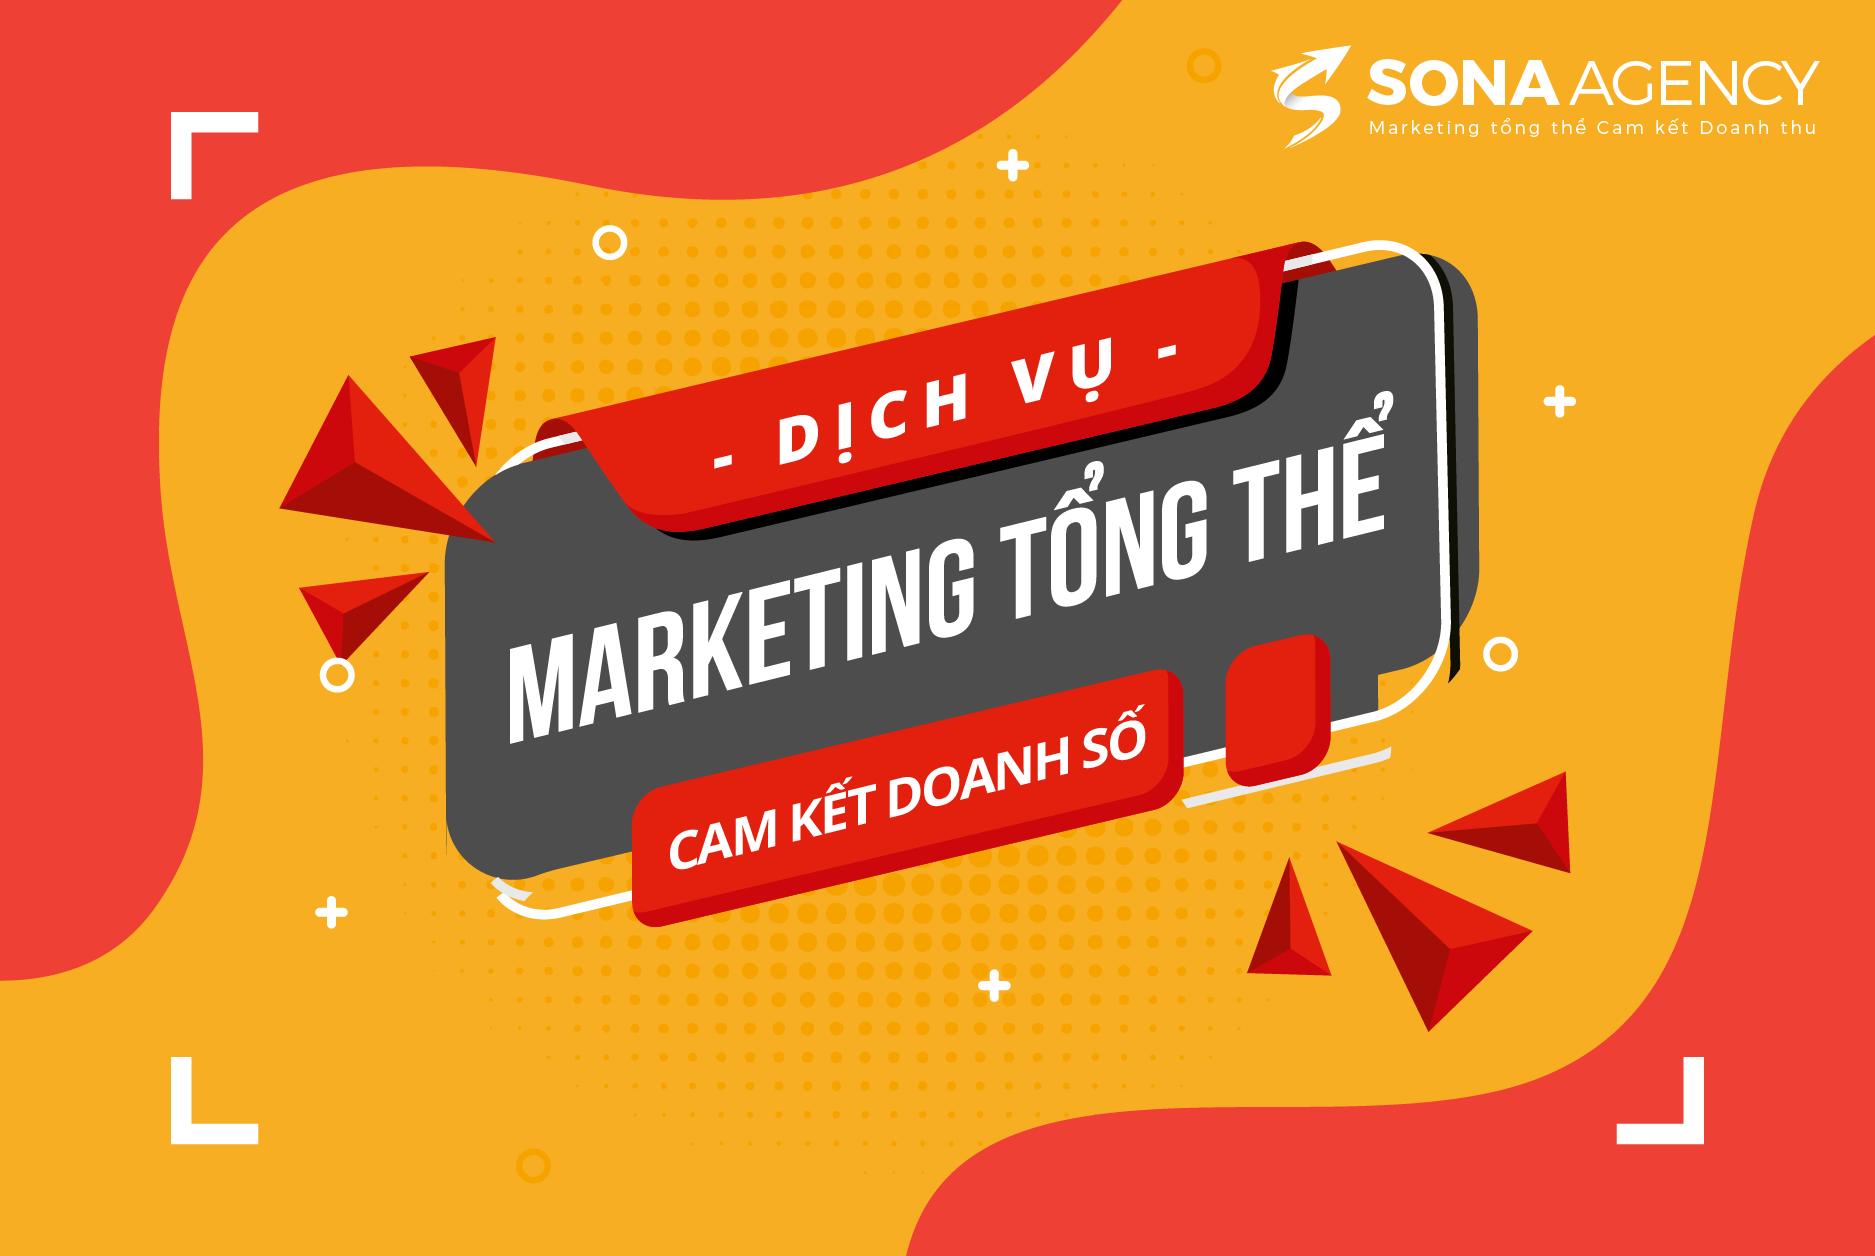 Marketing tổng thể cam kết doanh số sonaagency